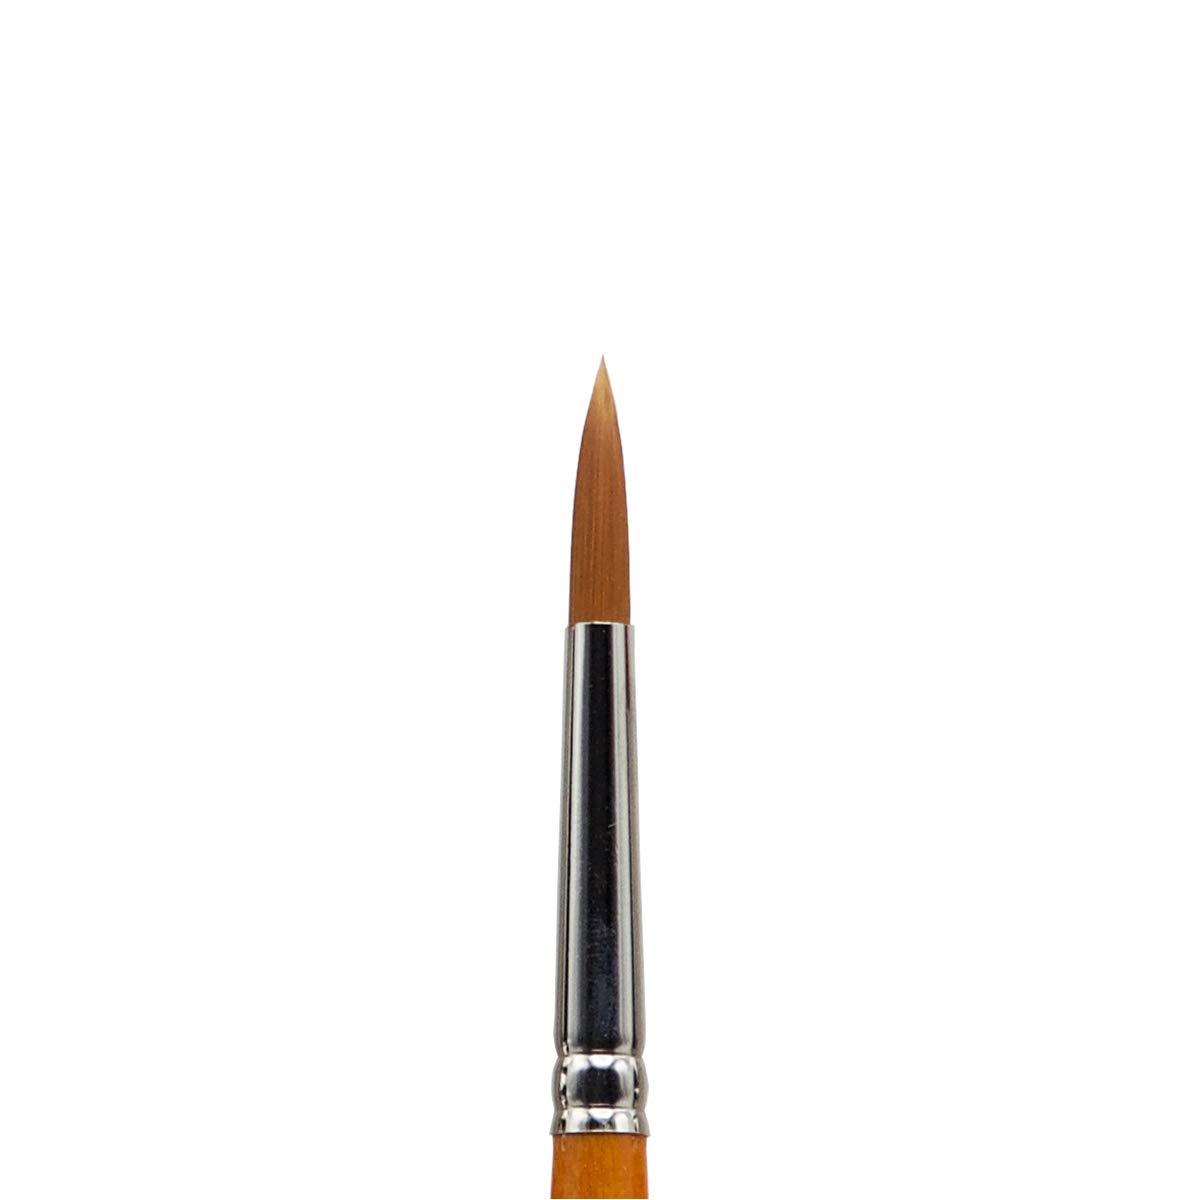 KINGART 6000-0 Premium Artist Brushes Radiant AP TAKLON Round Black//Silver//Orange